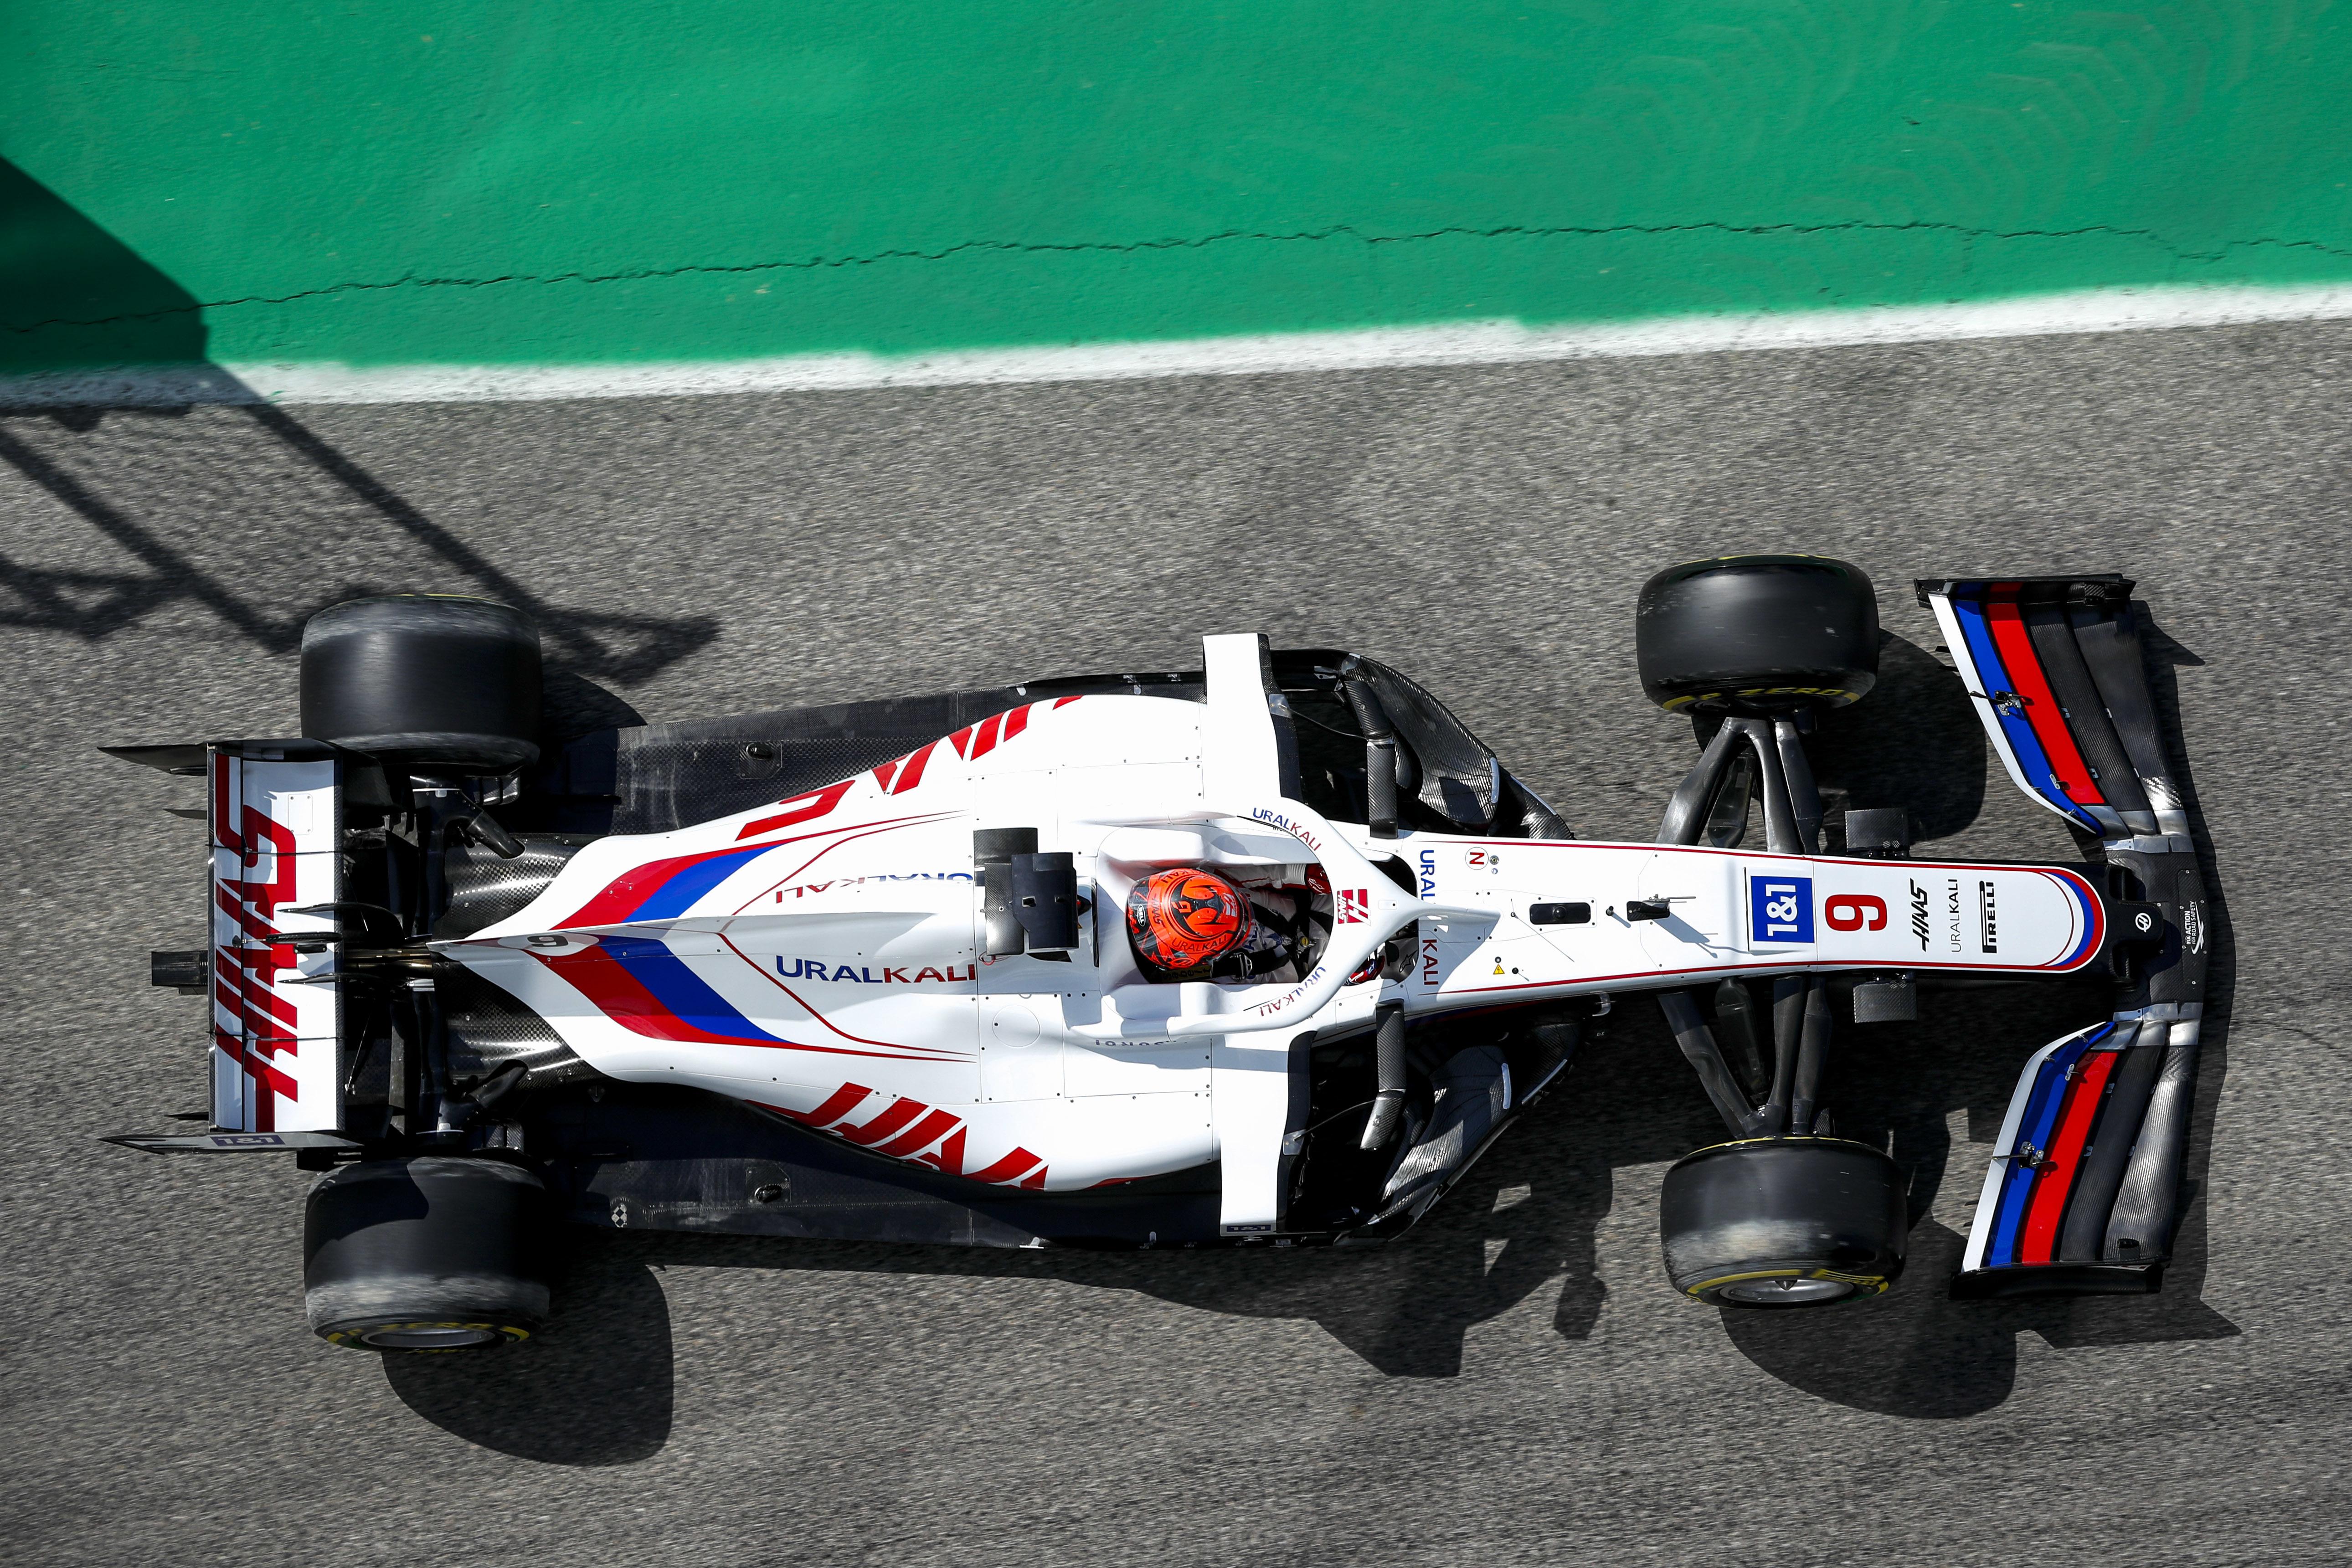 Nikita Mazepin, Uralkali Haas F1 Team